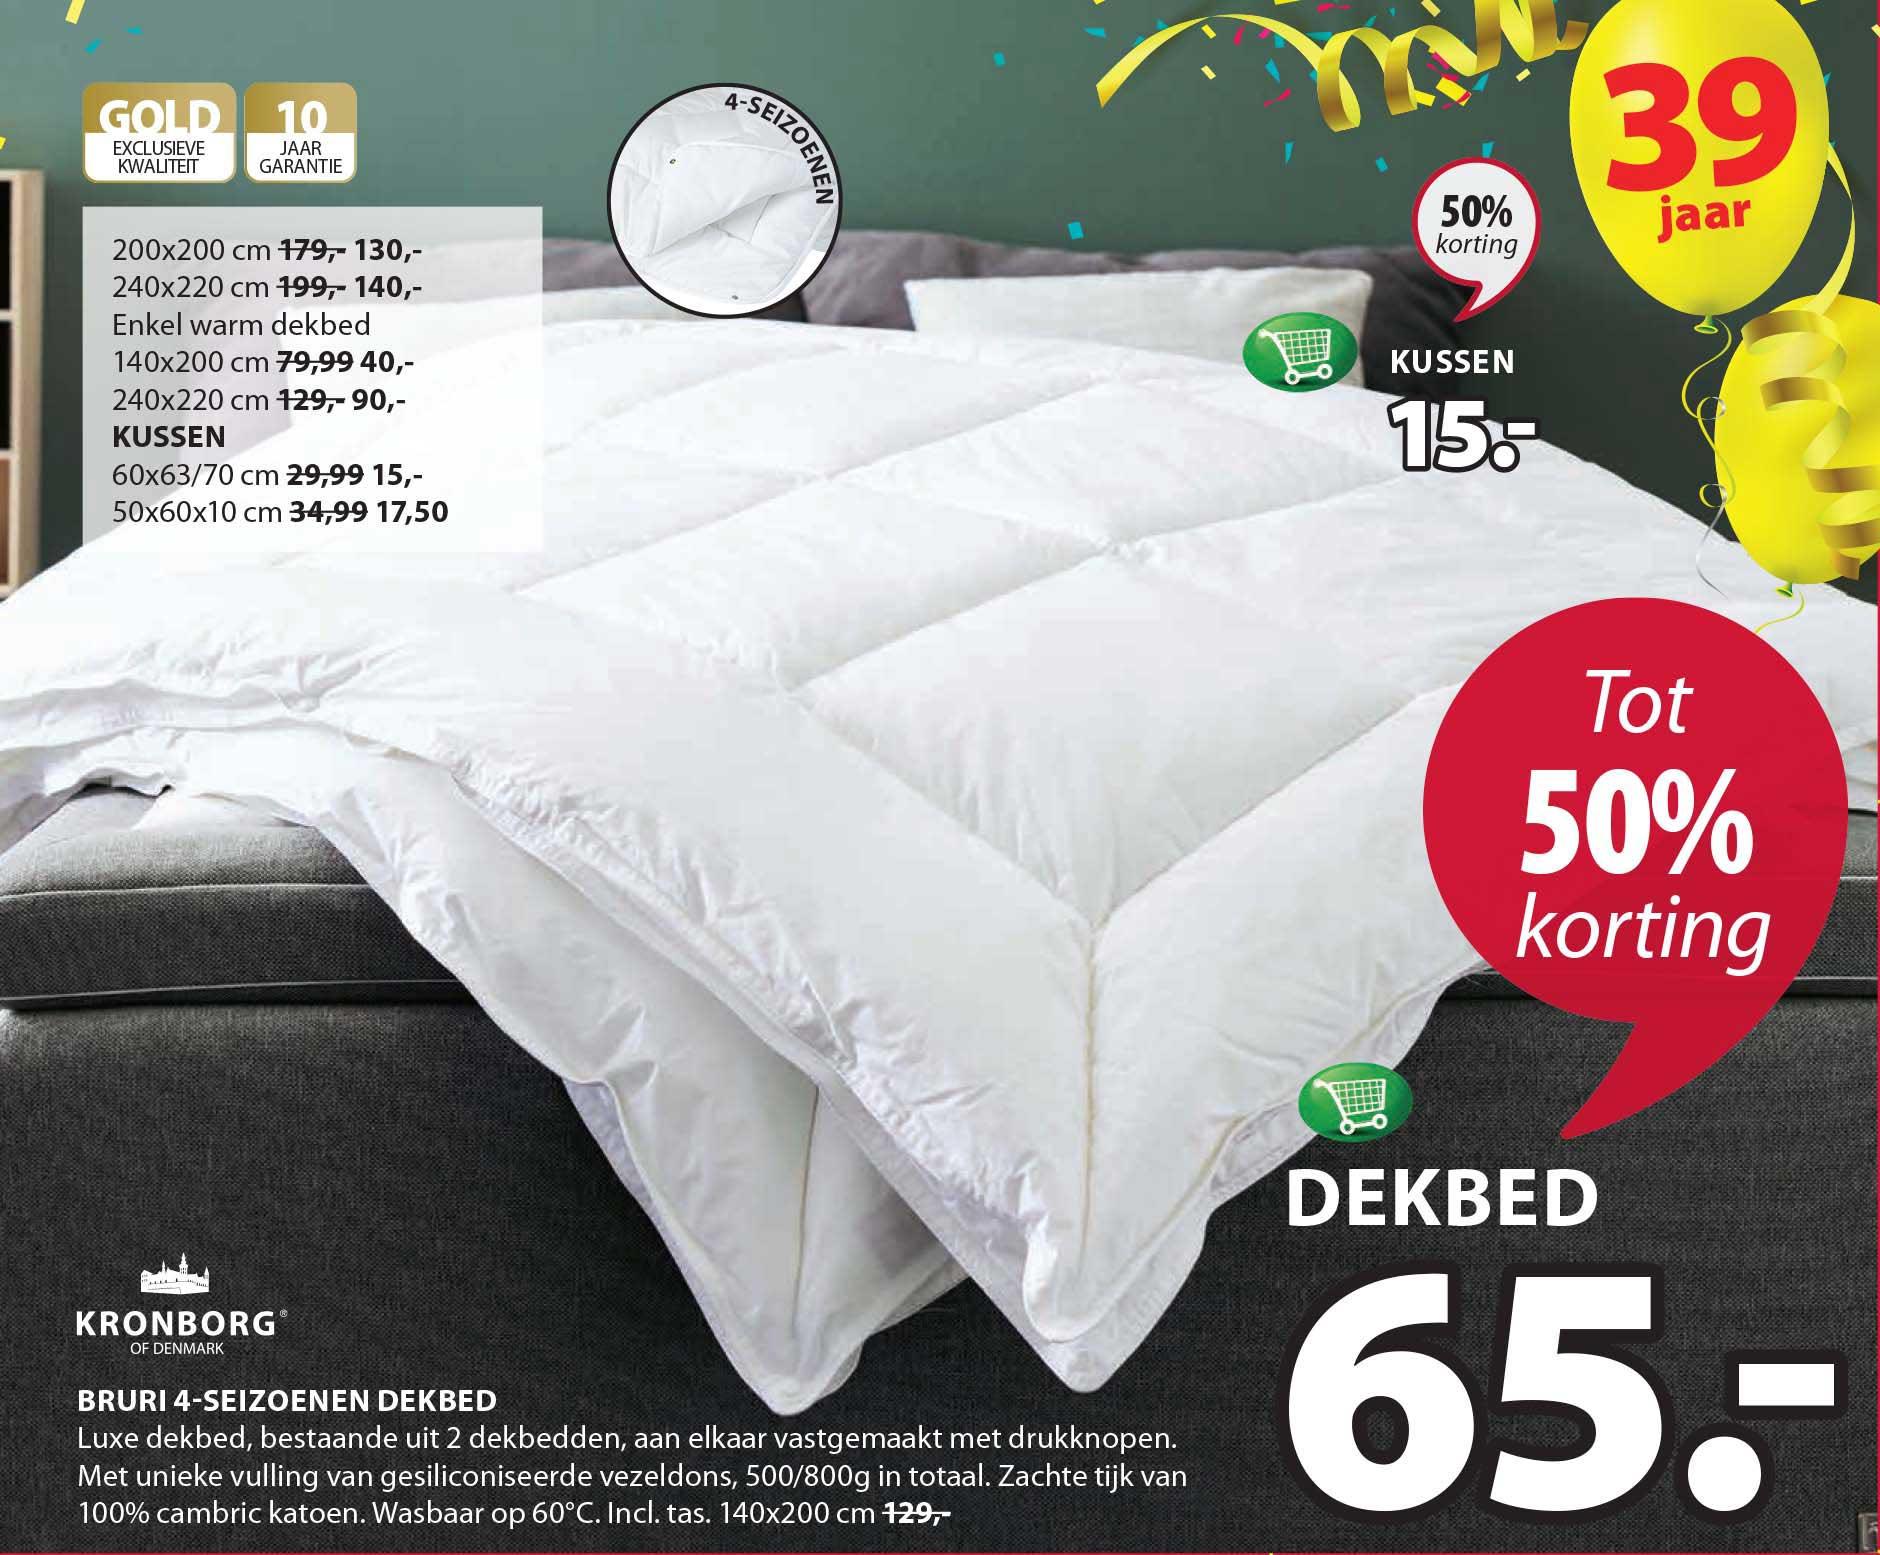 Jysk Kronborg Bruri 4 Seizoenen Dekbed: Tot 50% Korting